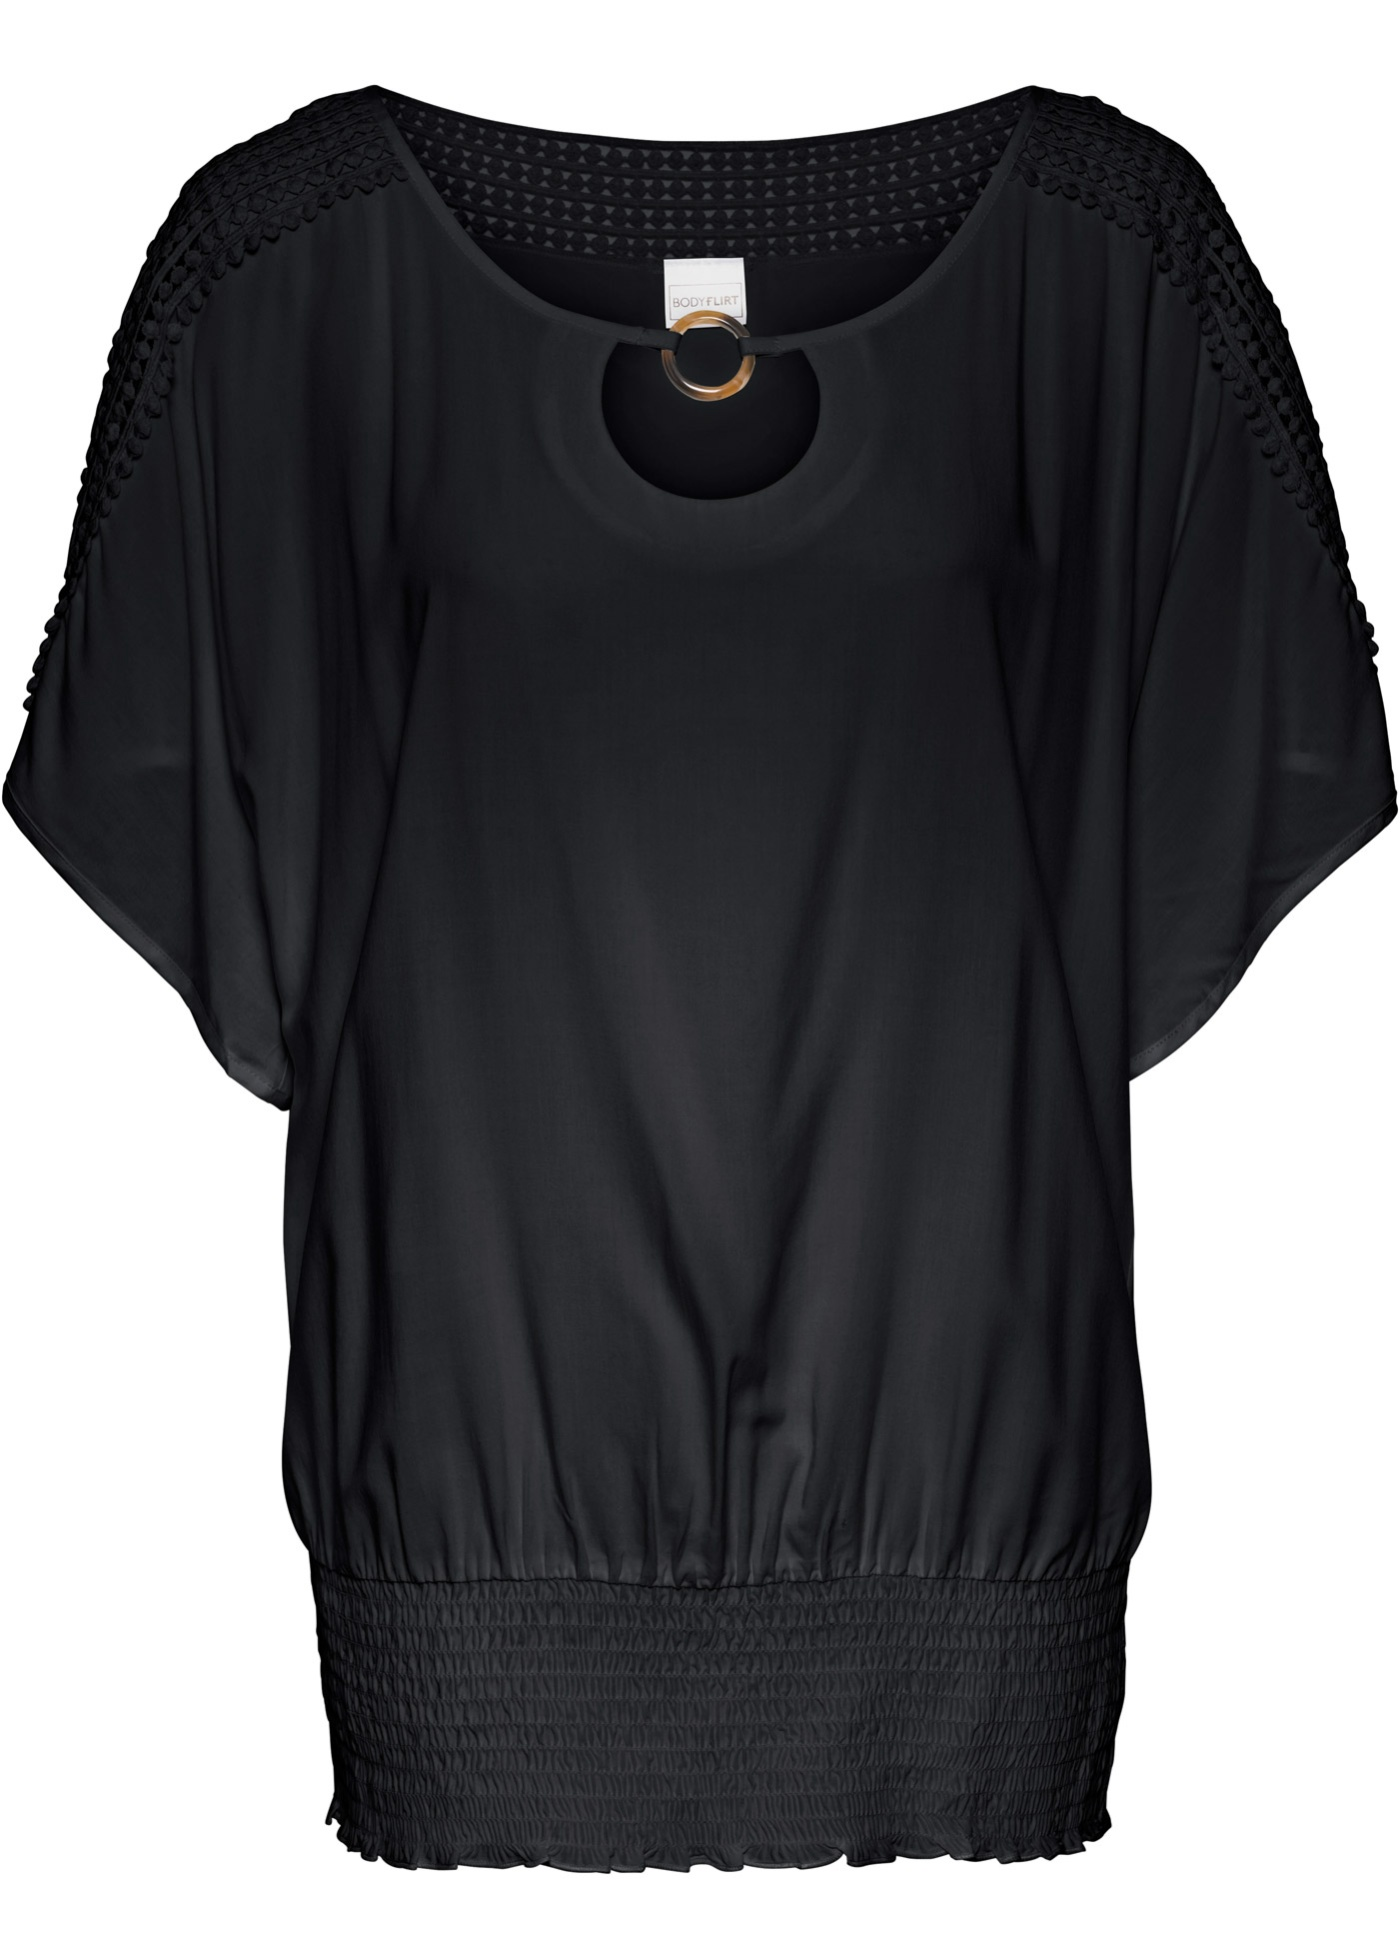 Tunika s krajkou - Černá